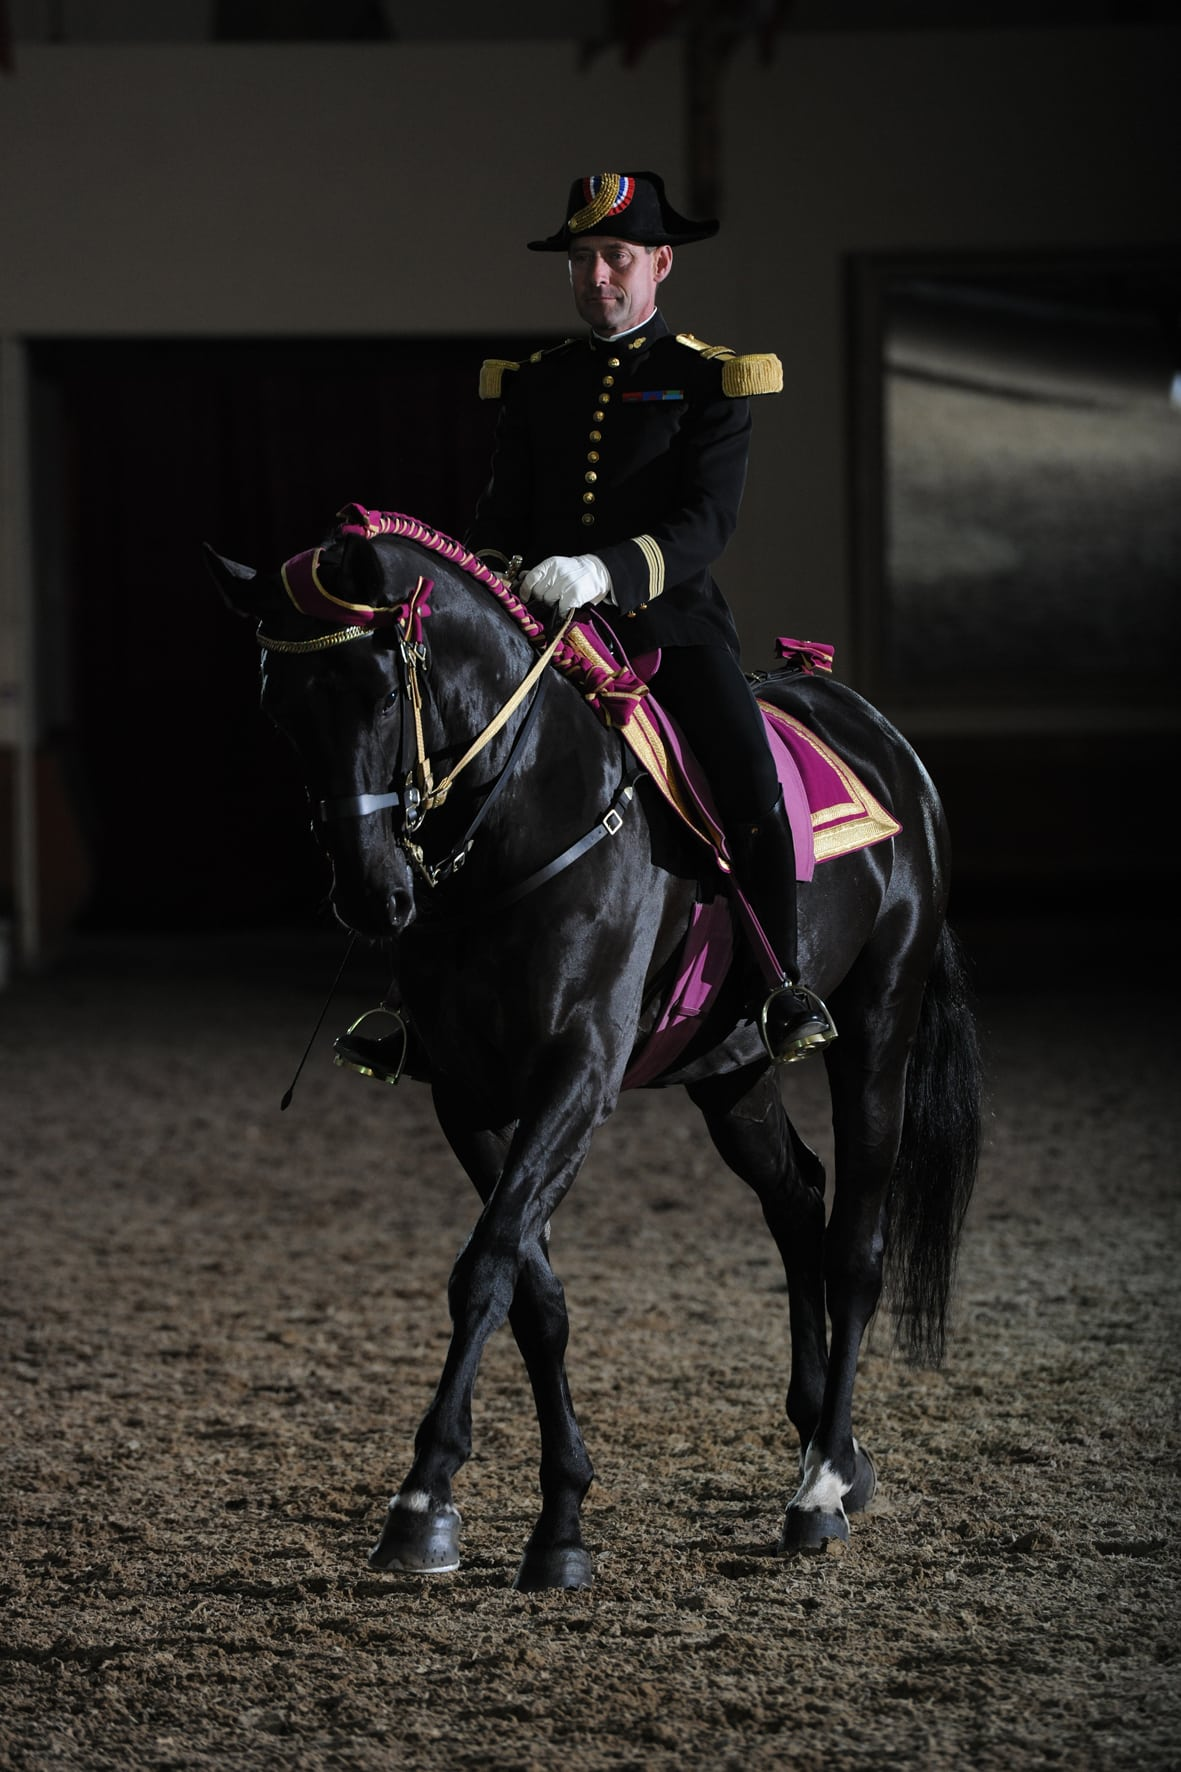 Unesco, Dijon s'inspire du prestigieux Cadre Noir